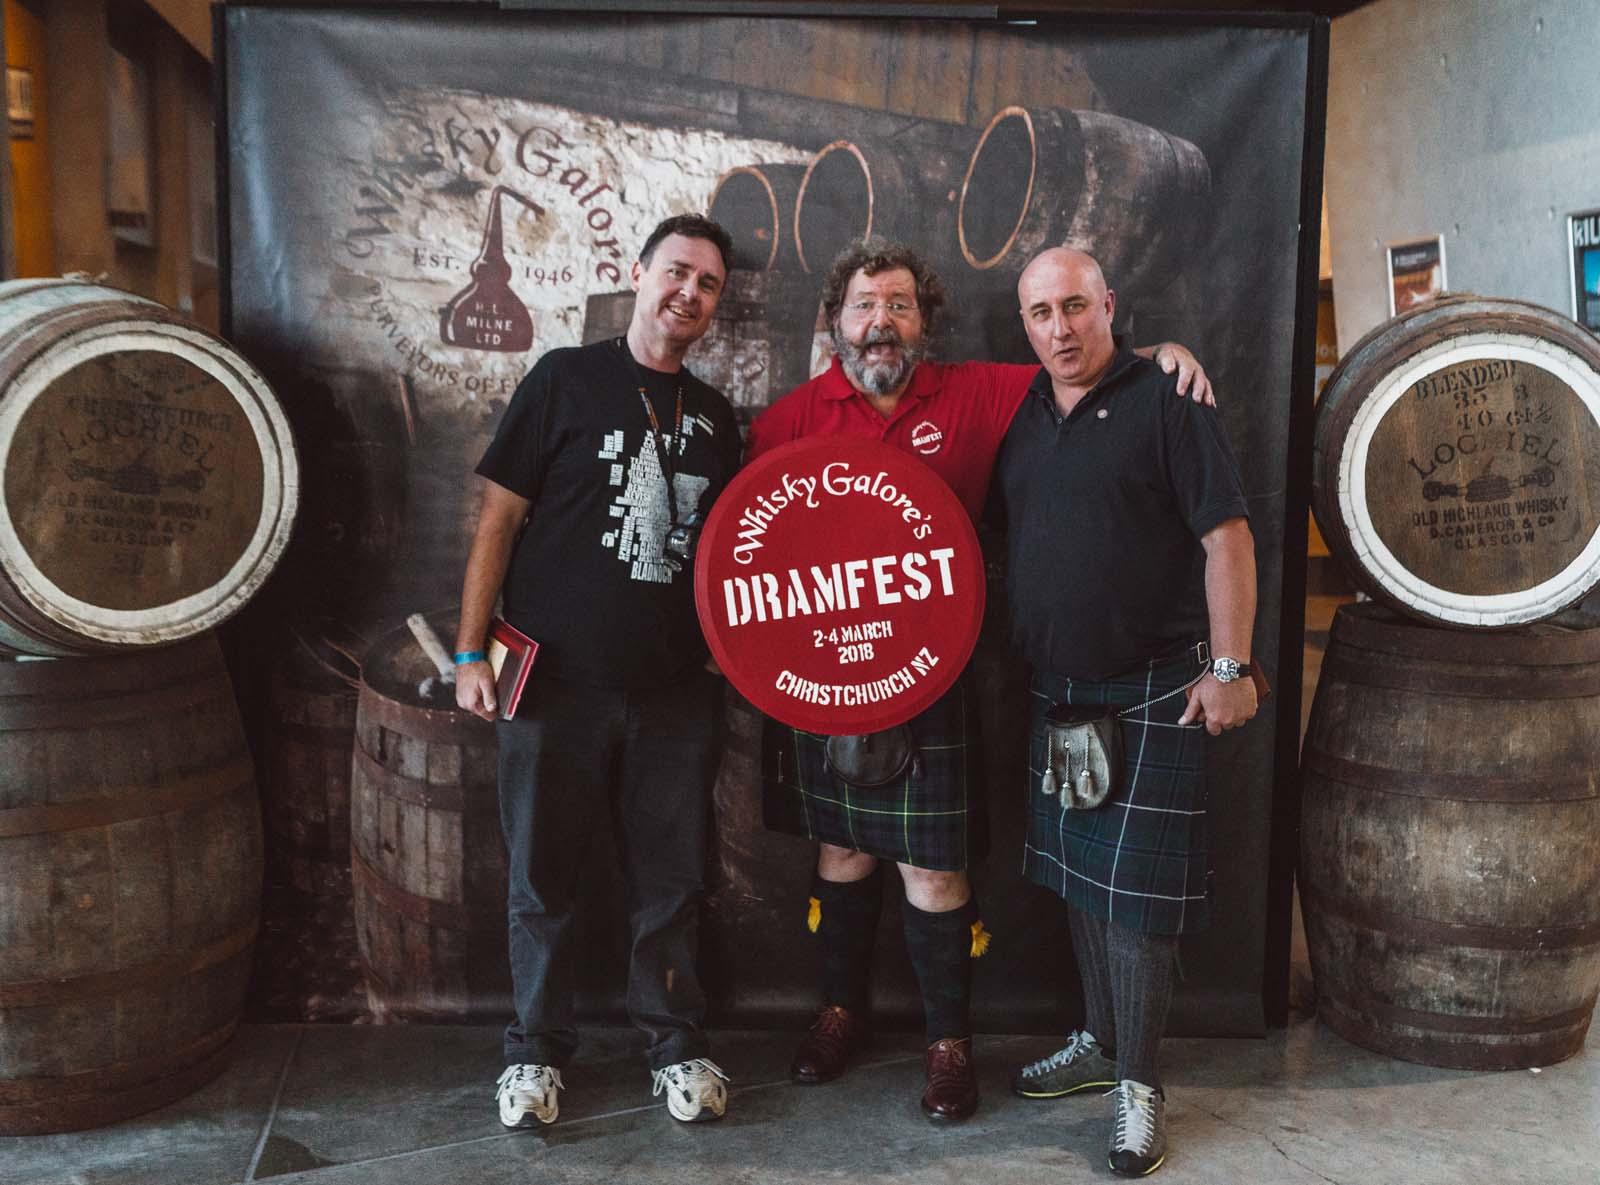 Dramfest 2018 for Whisky Galore-106.jpg